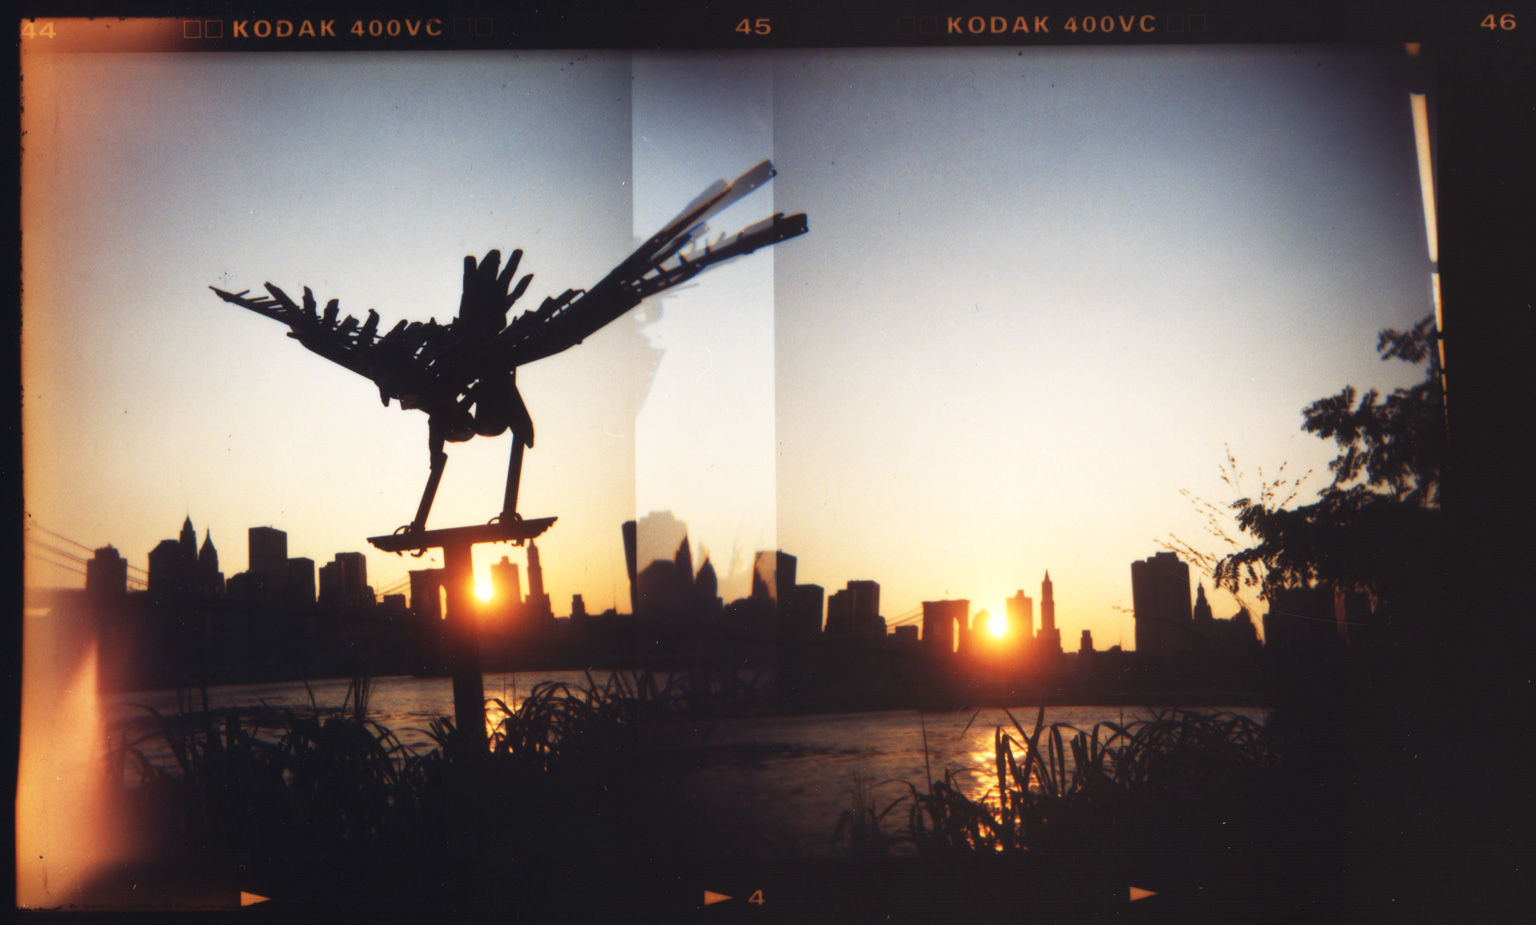 BrooklynBirdStatue